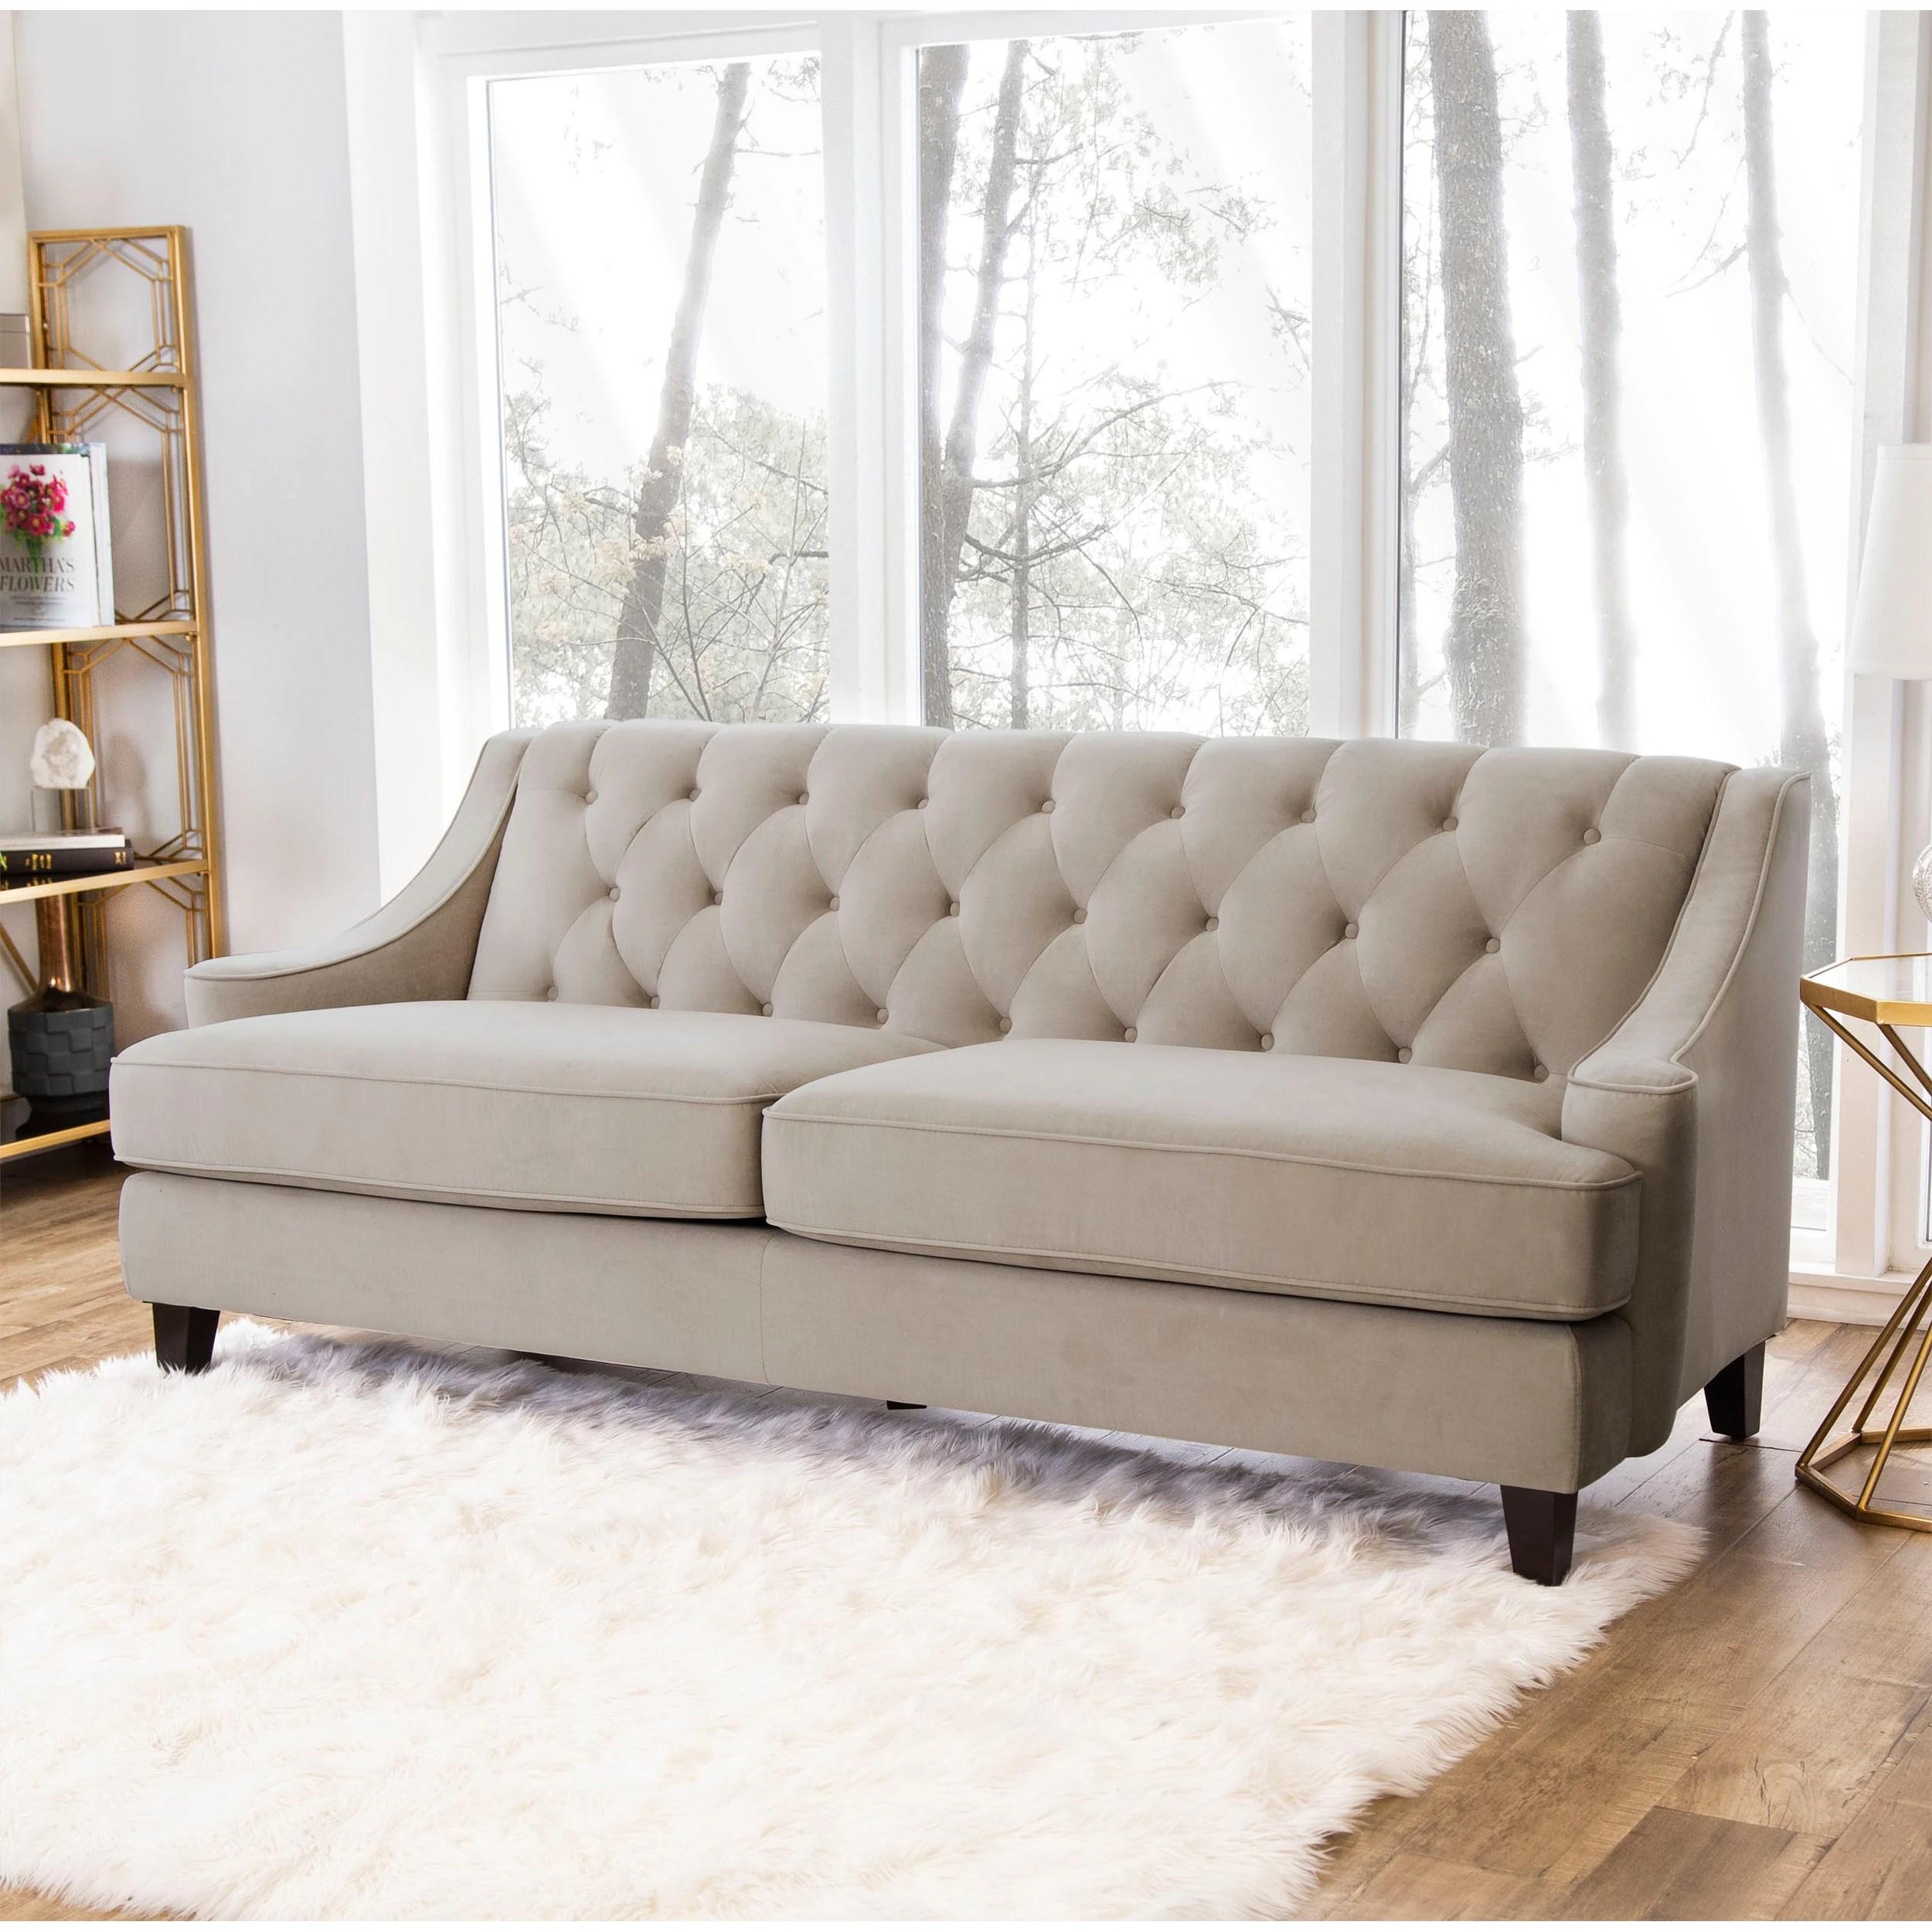 Abbyson Claridge Taupe Velvet Fabric Tufted Sofa Overstock 9556549